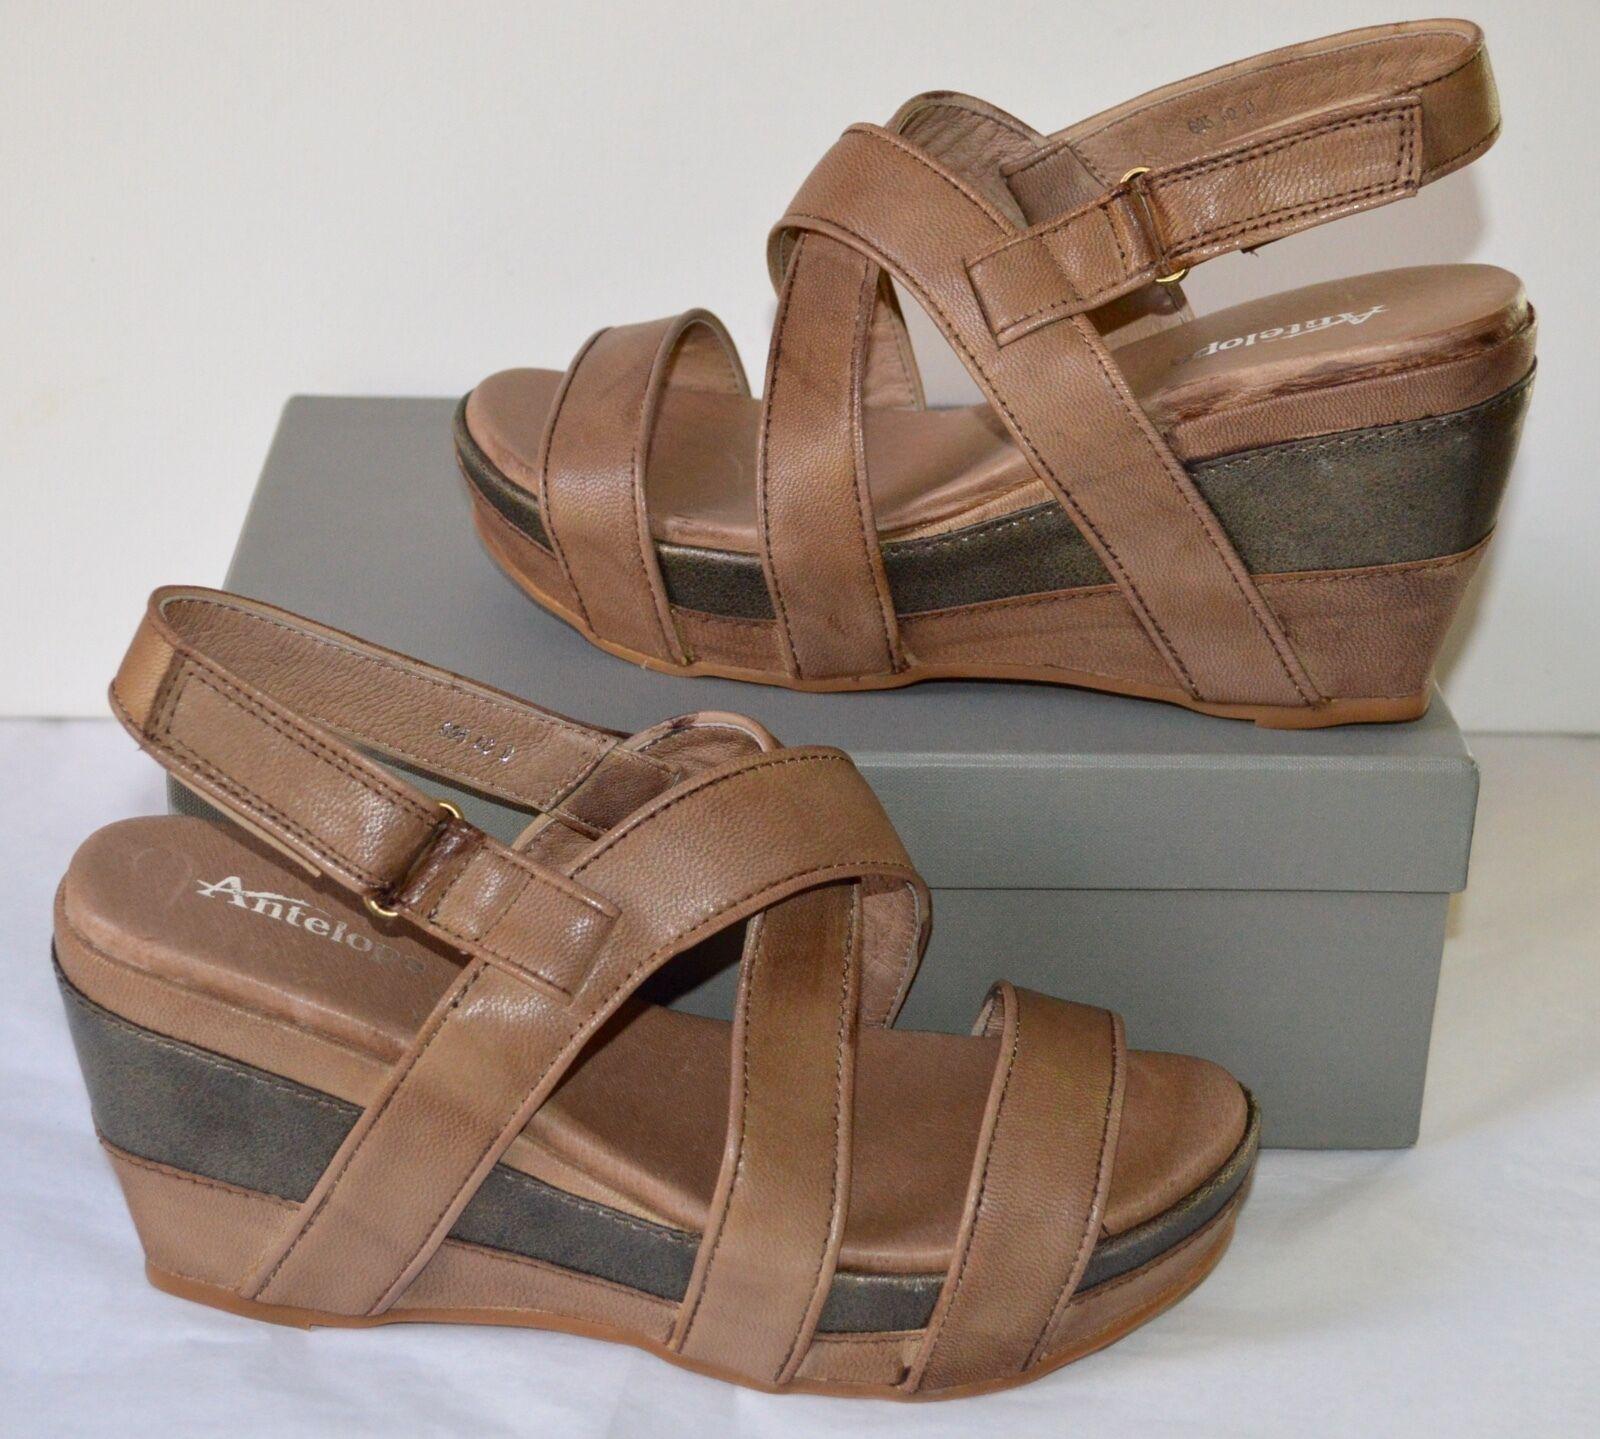 New 195 Antelope Style 695 Taupe Brush Leder Sandale Sandale Sandale Wedge/Platform sz 40/9 145dd6